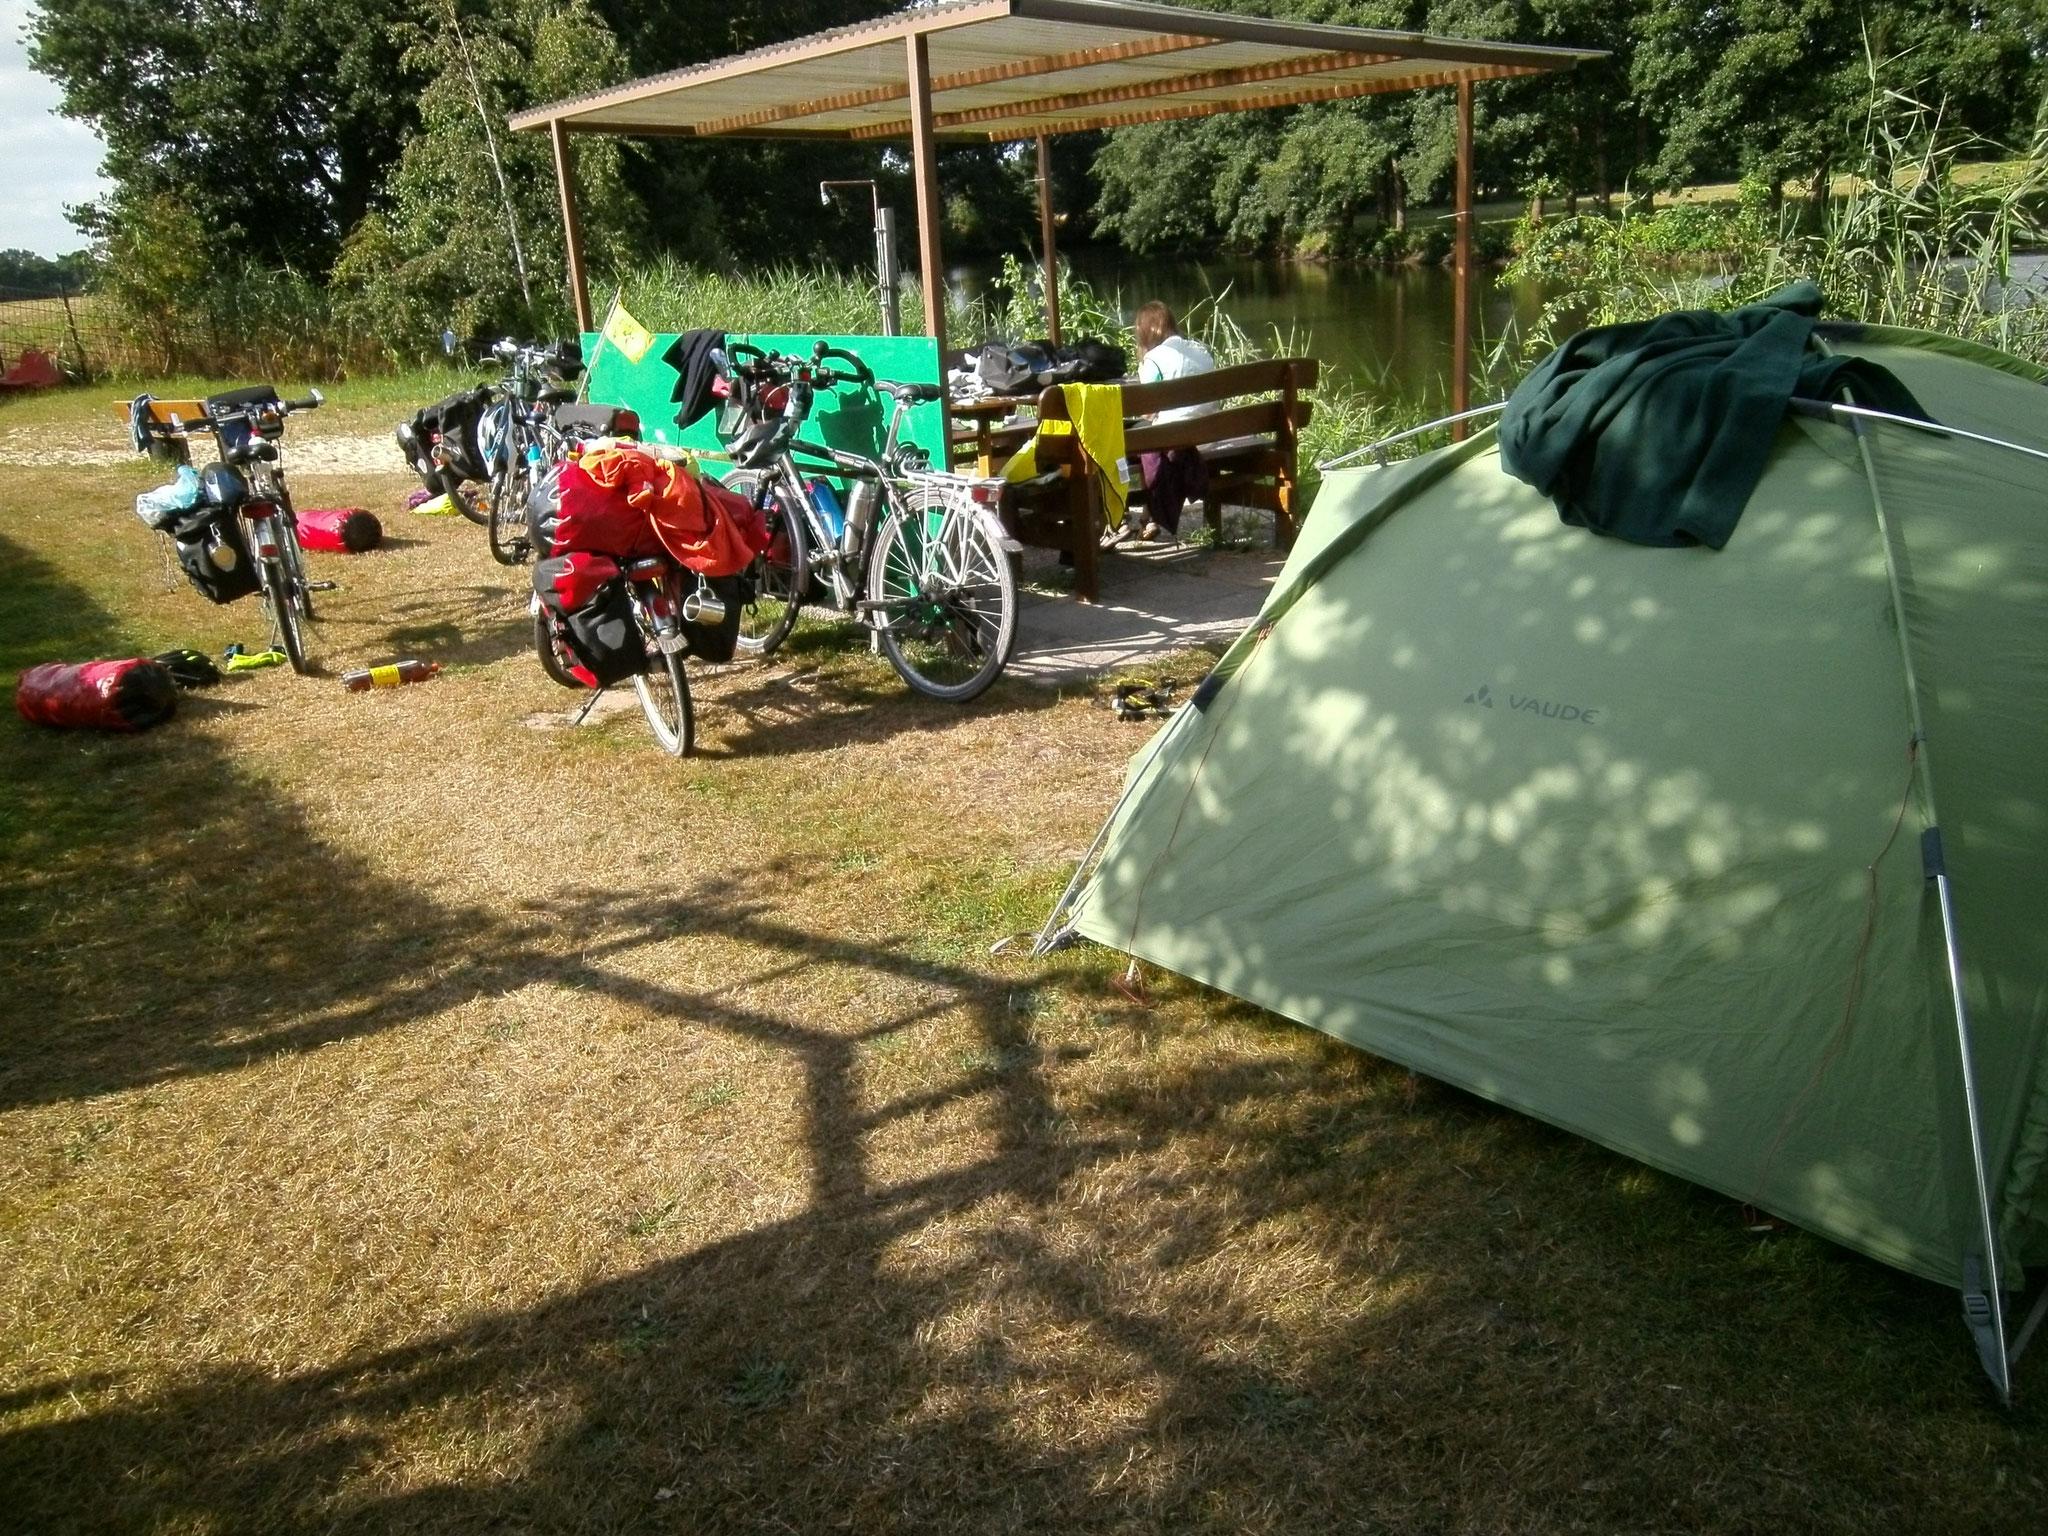 Camping am See, Eiltzendorf